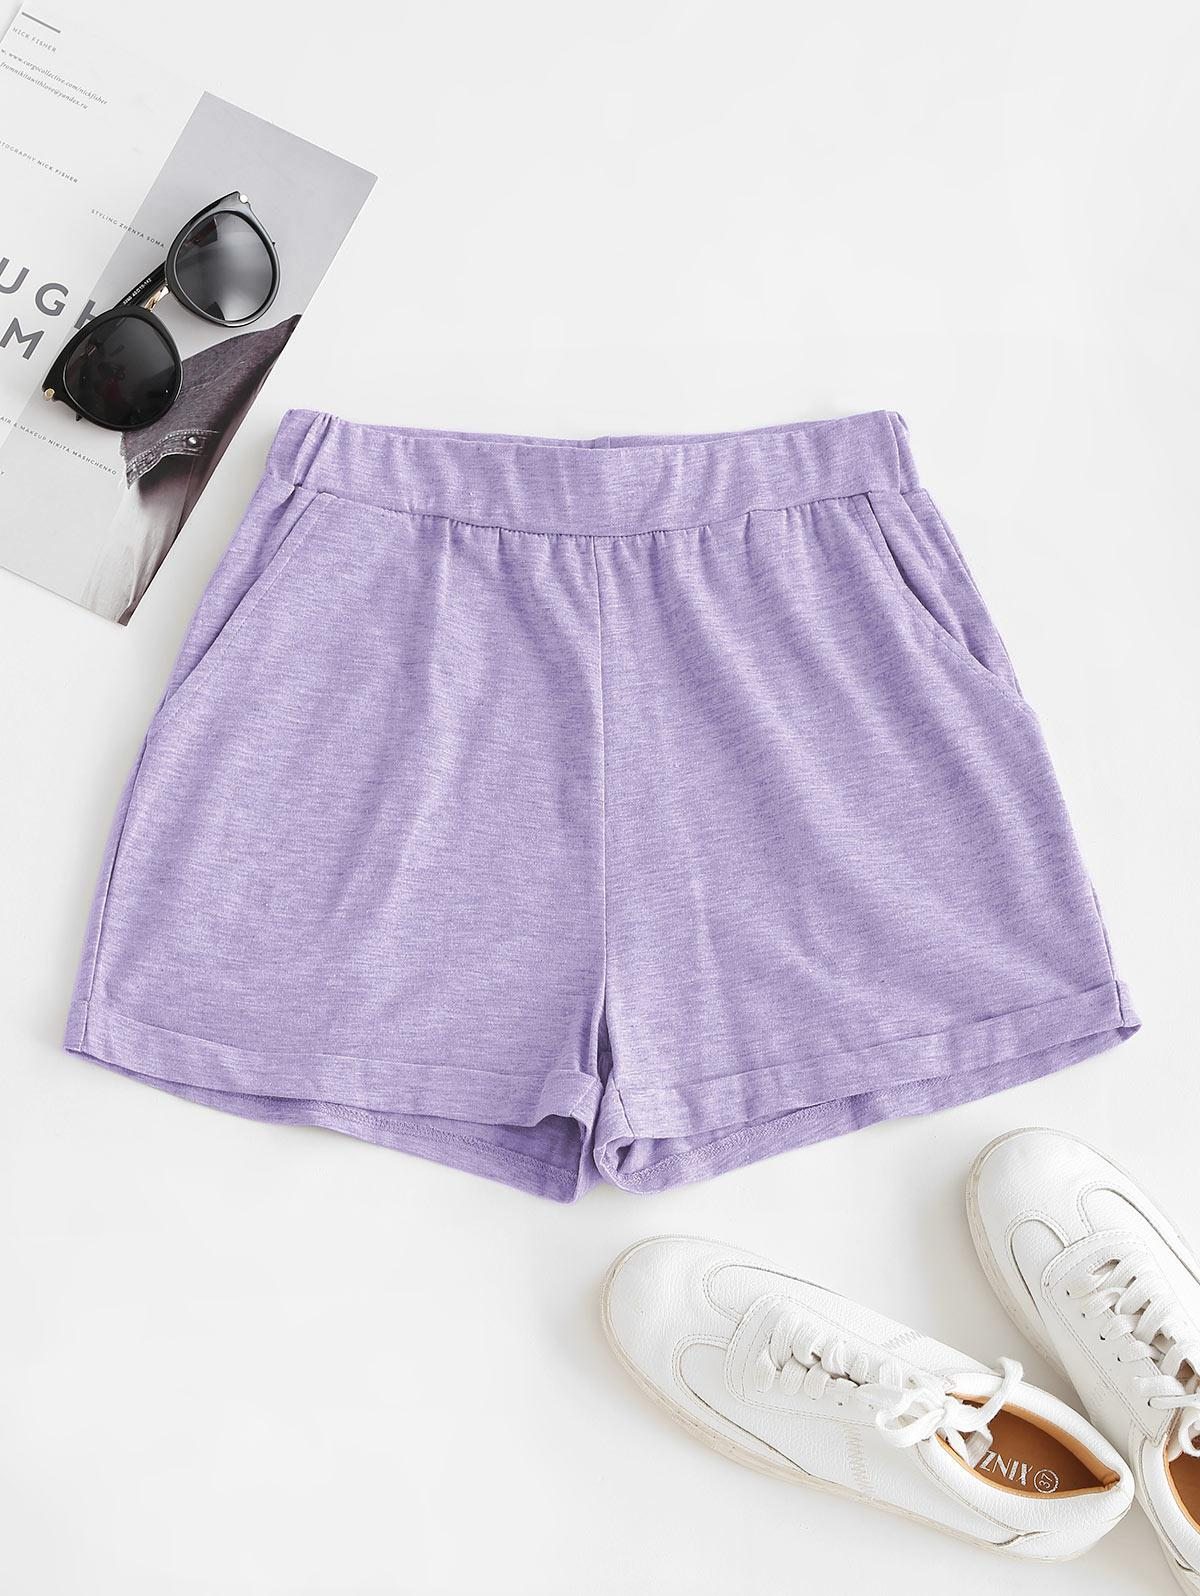 ZAFUL Pull On Pocket Cuffed Shorts